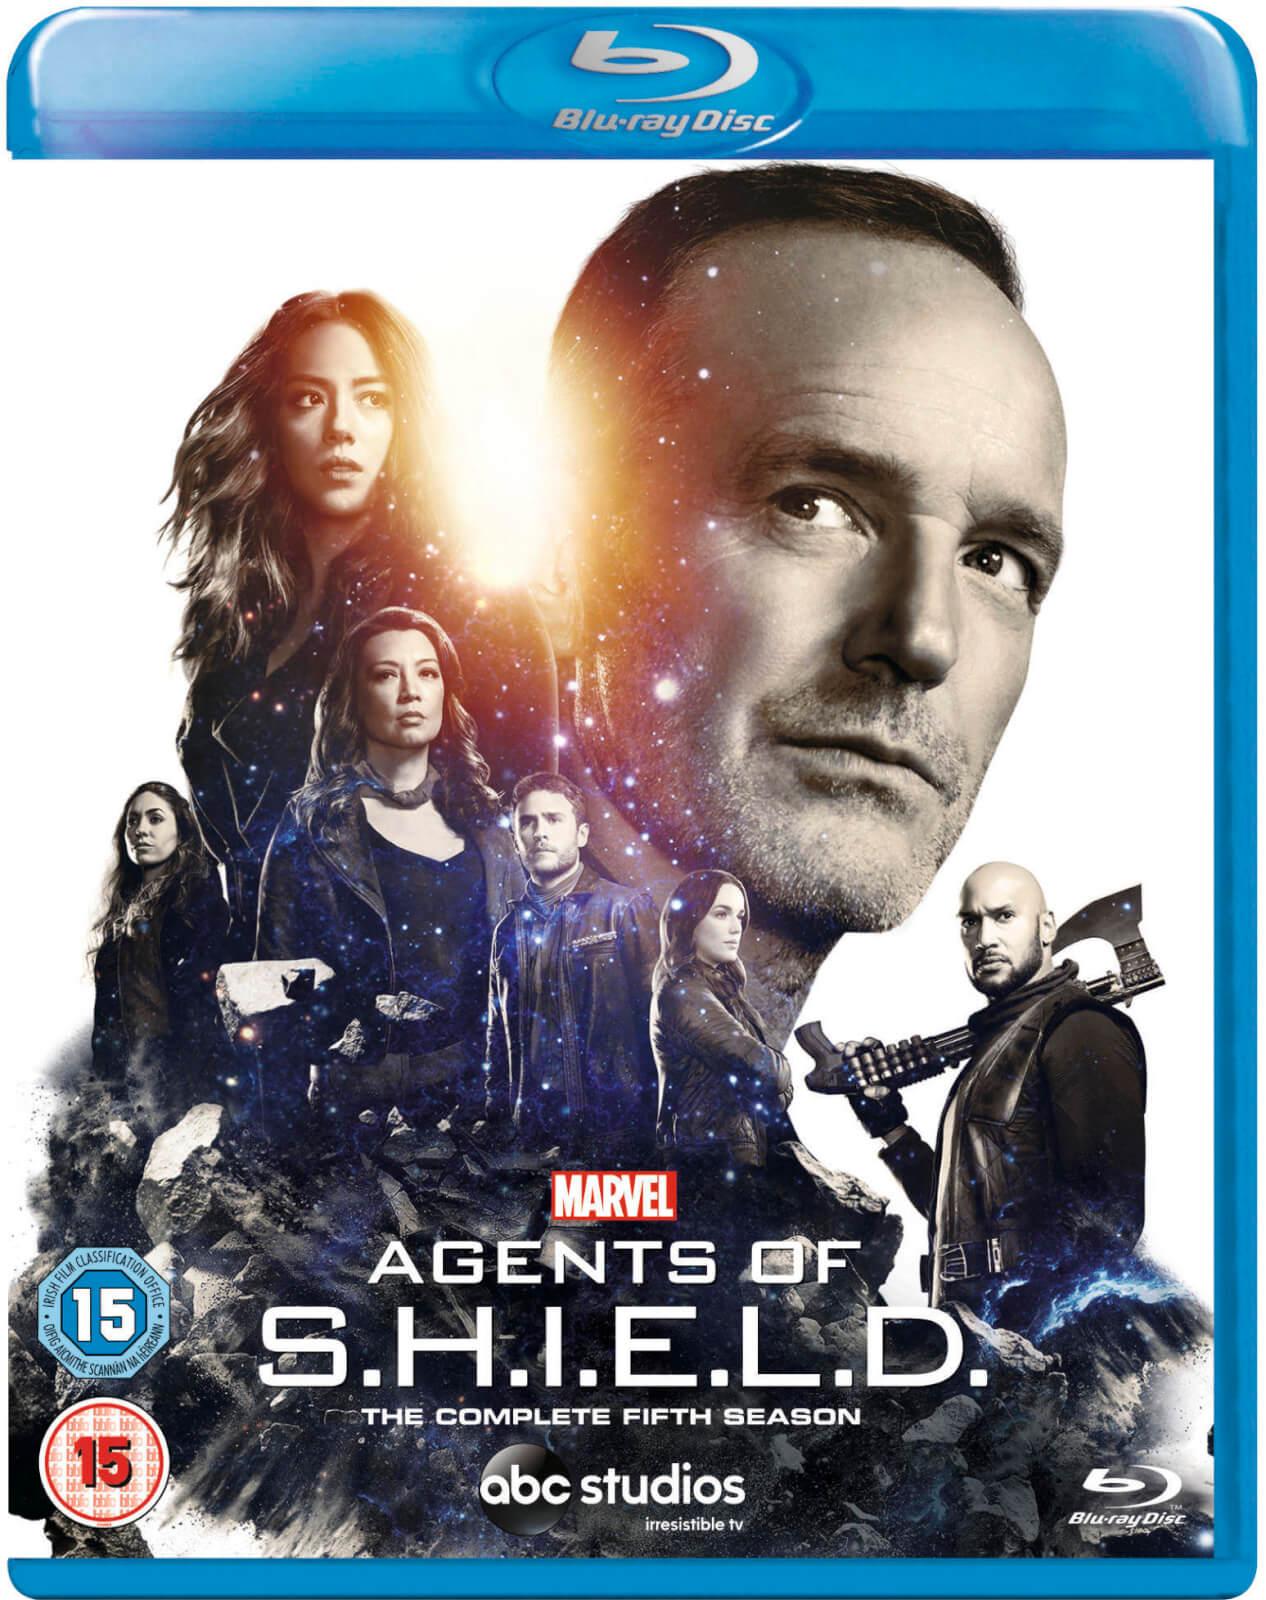 Marvel's Agents Of S.H.I.E.L.D. Staffel 1 bis 5 | Blu-ray | 2x Staffel für 17€ | auch Endgame, Far from Home, Captain Marvel ...